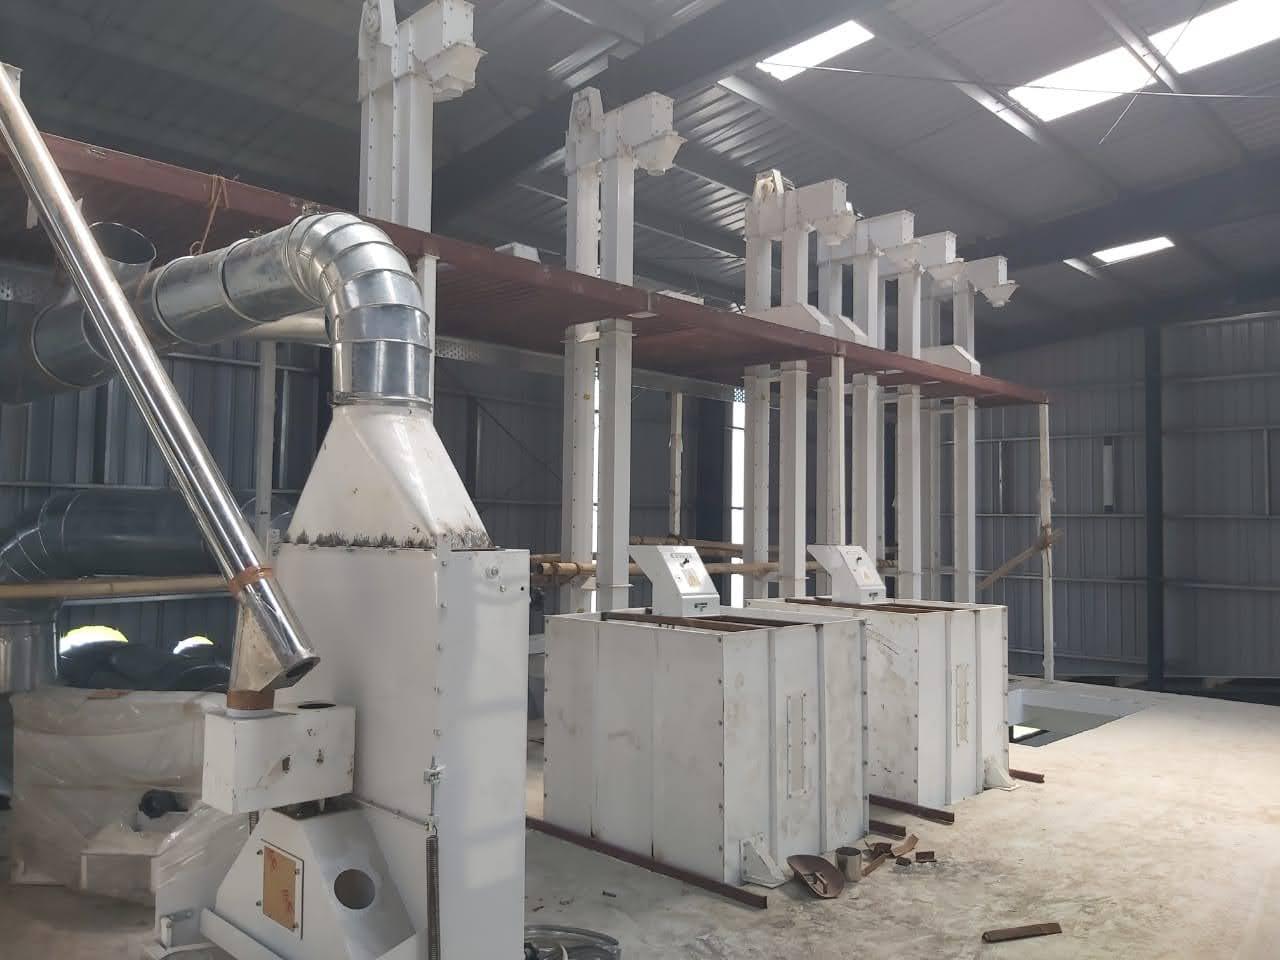 Installation _ Fabrication Work